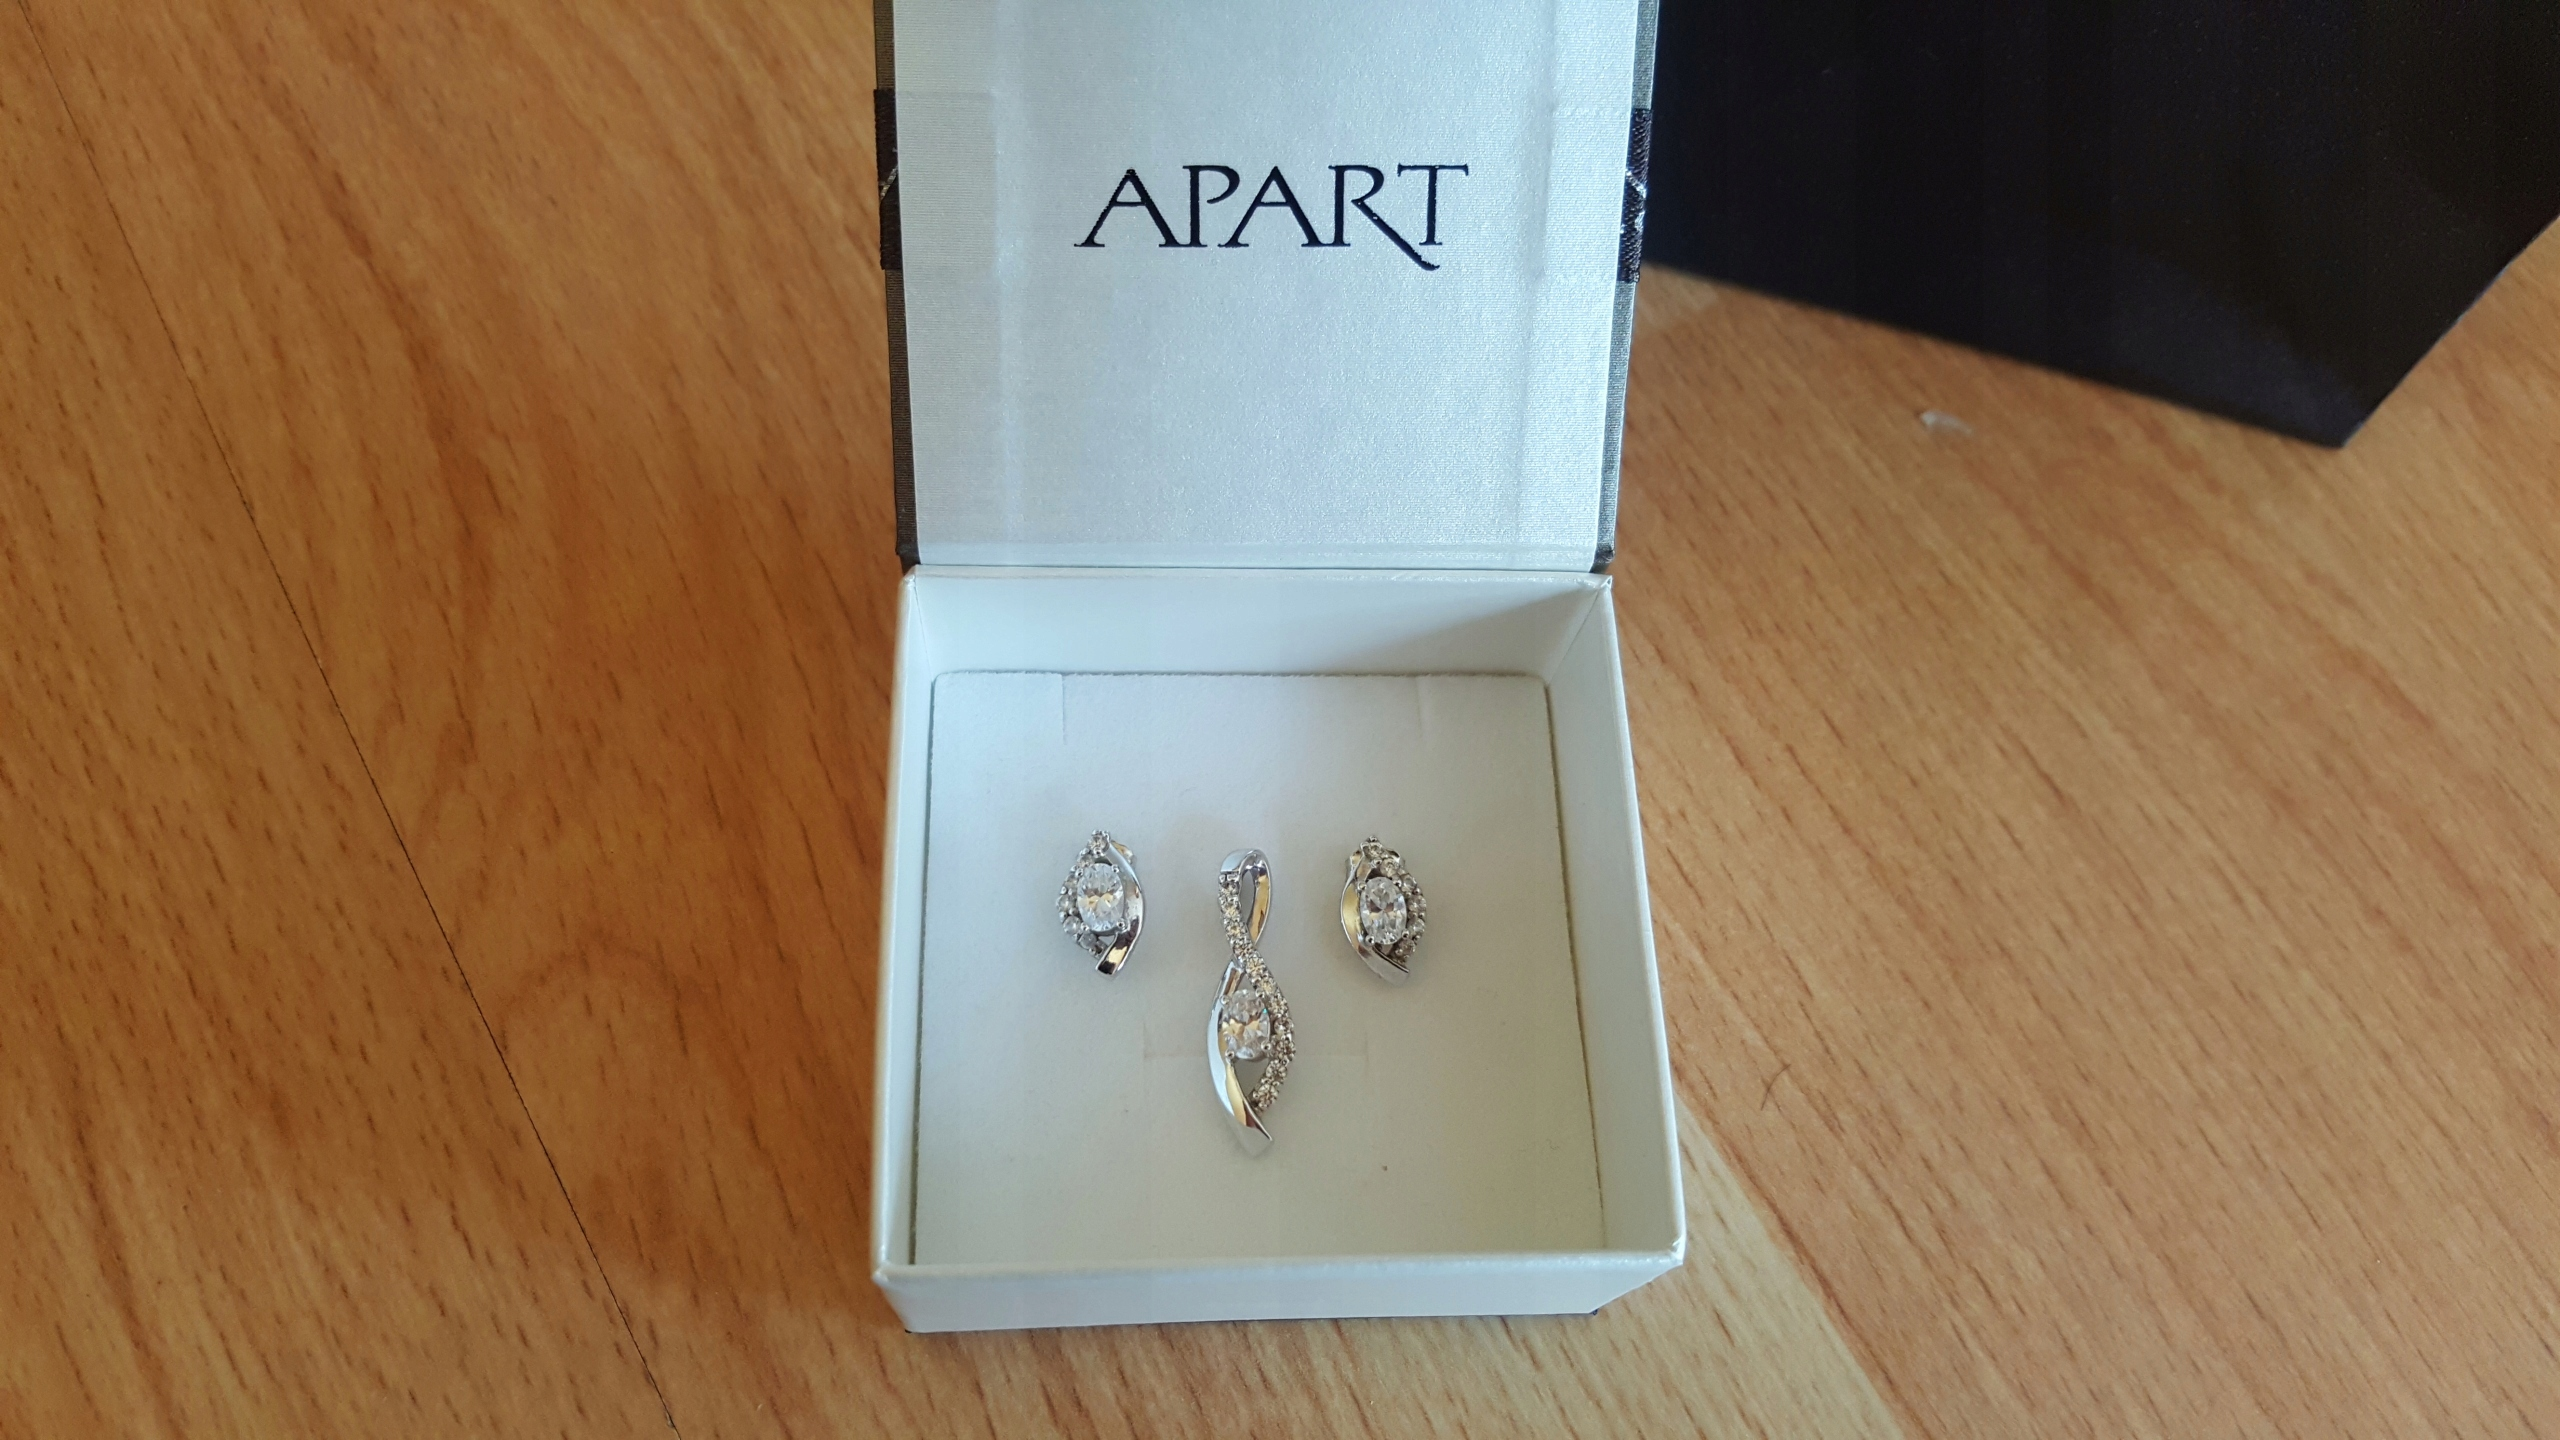 1c5ae9033c47 APART zestaw komplet biżuterii srebrnej JAK NOWY - 7570601070 ...